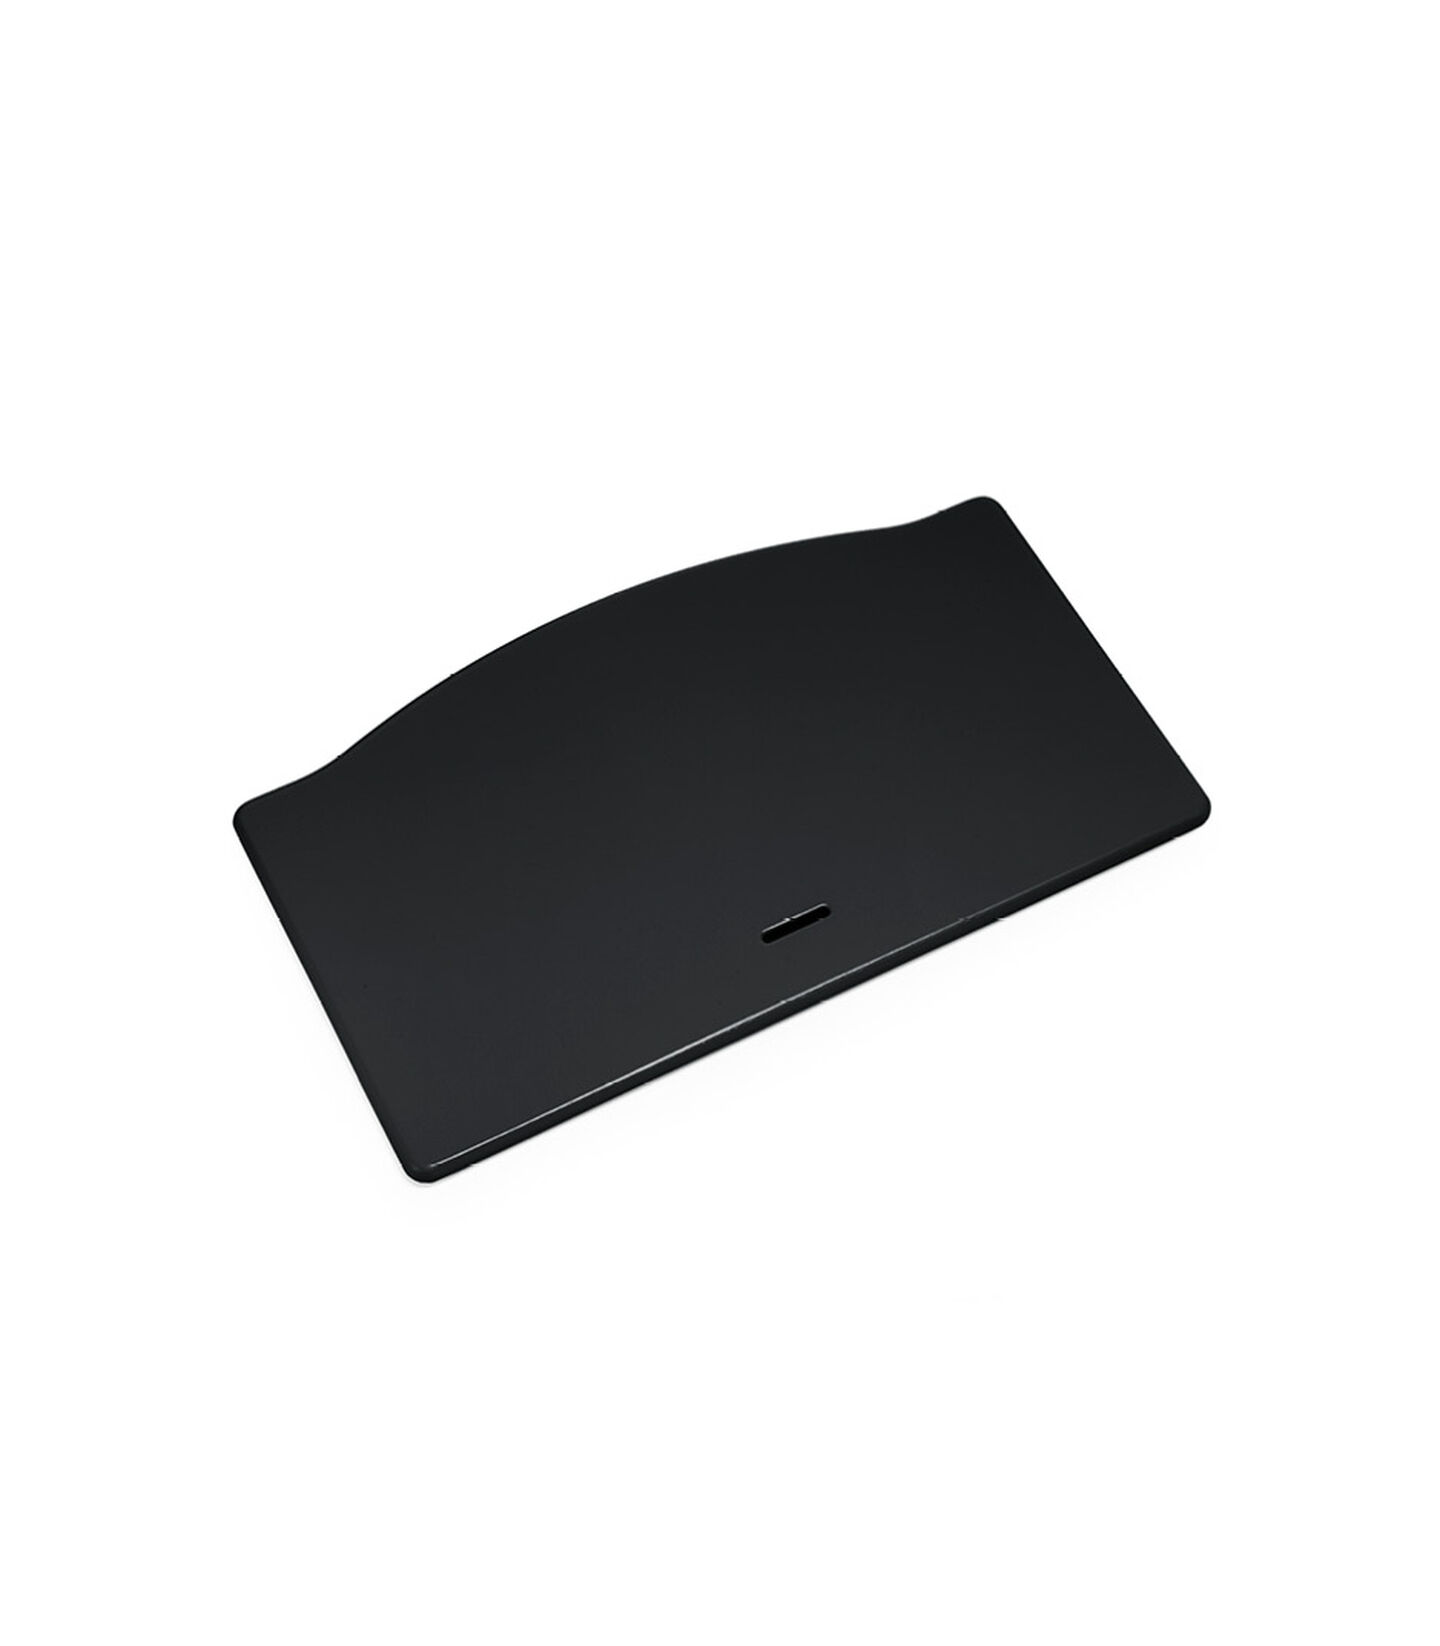 Tripp Trapp® Zitplaat Black, Black, mainview view 2